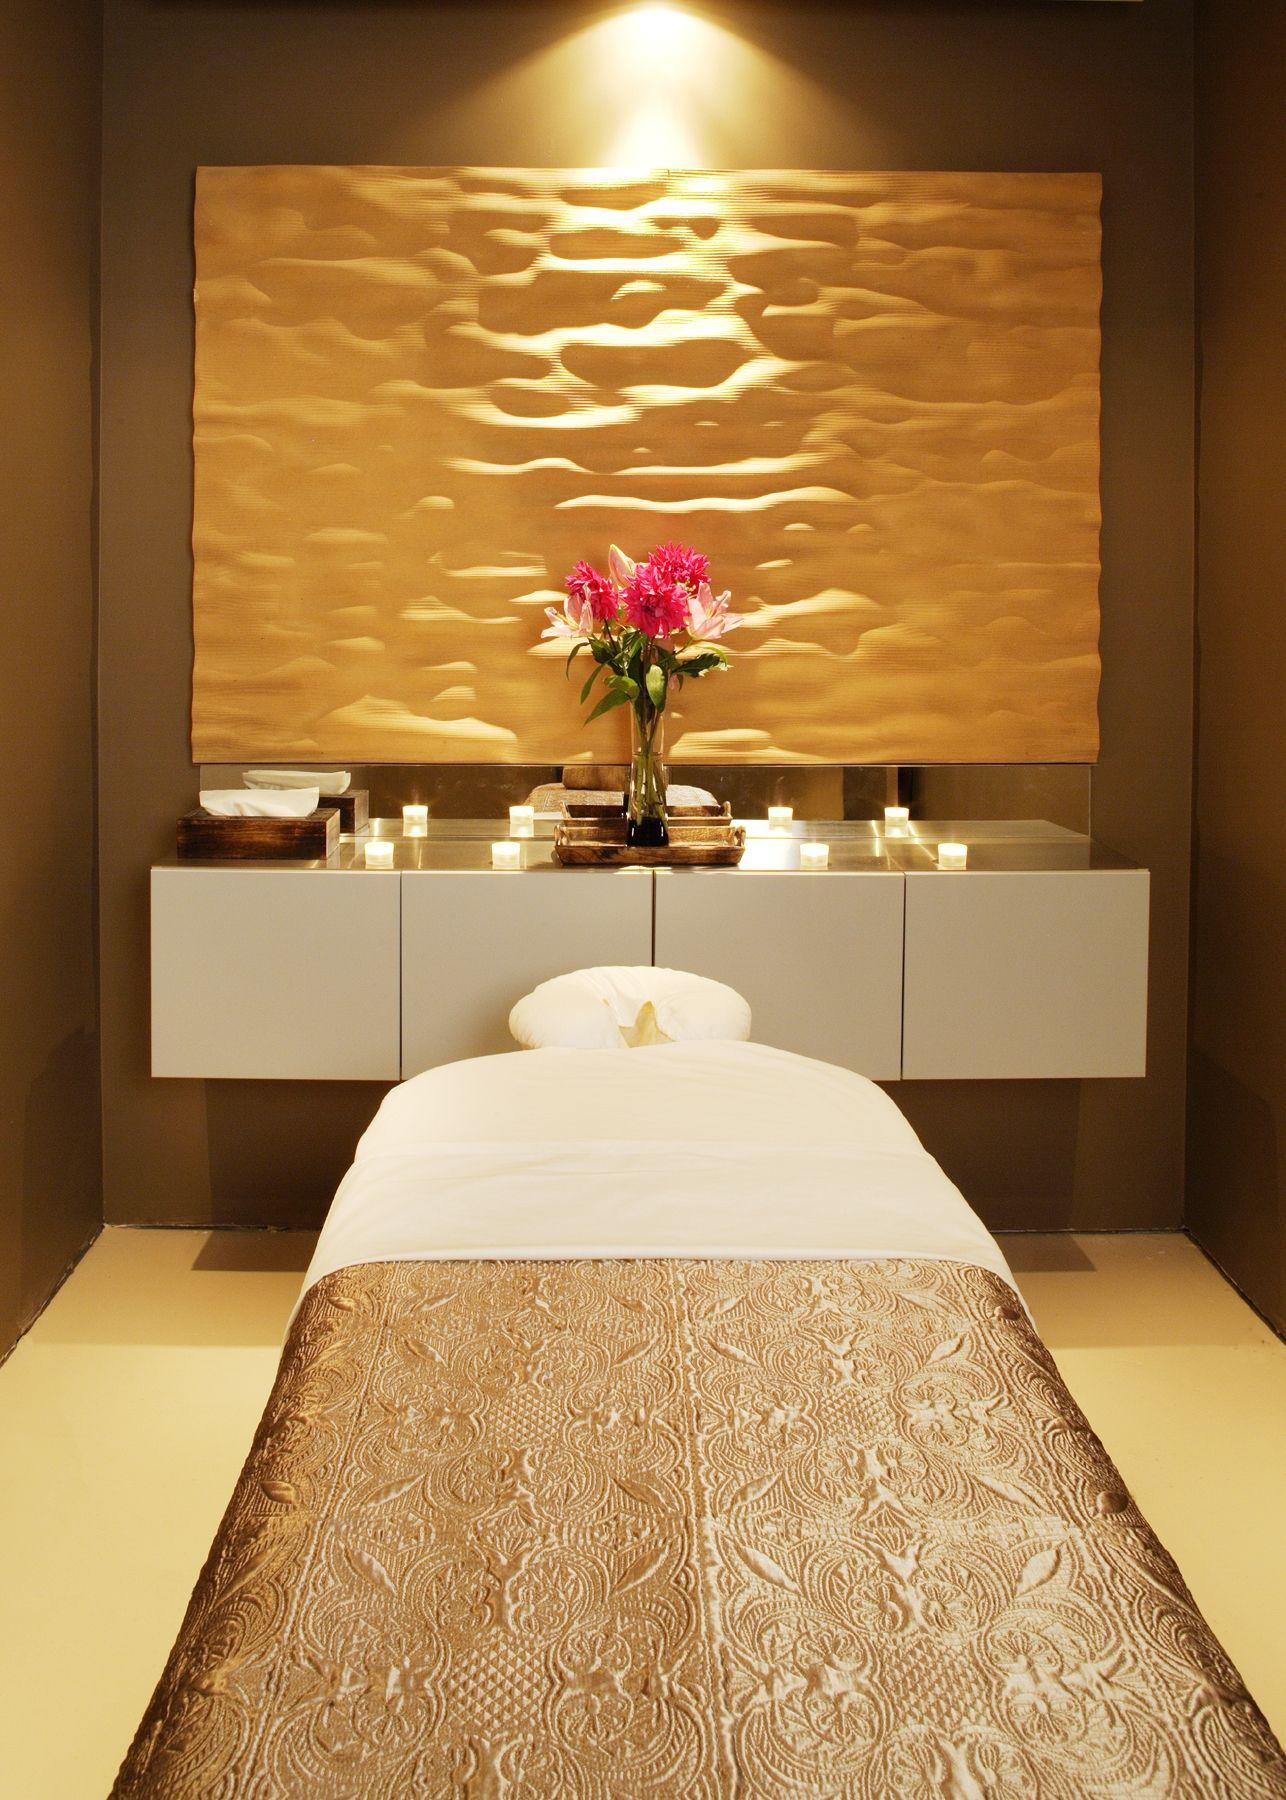 hammam spa toronto 2012 spawards winner local spas pinterest spa toronto and salons. Black Bedroom Furniture Sets. Home Design Ideas